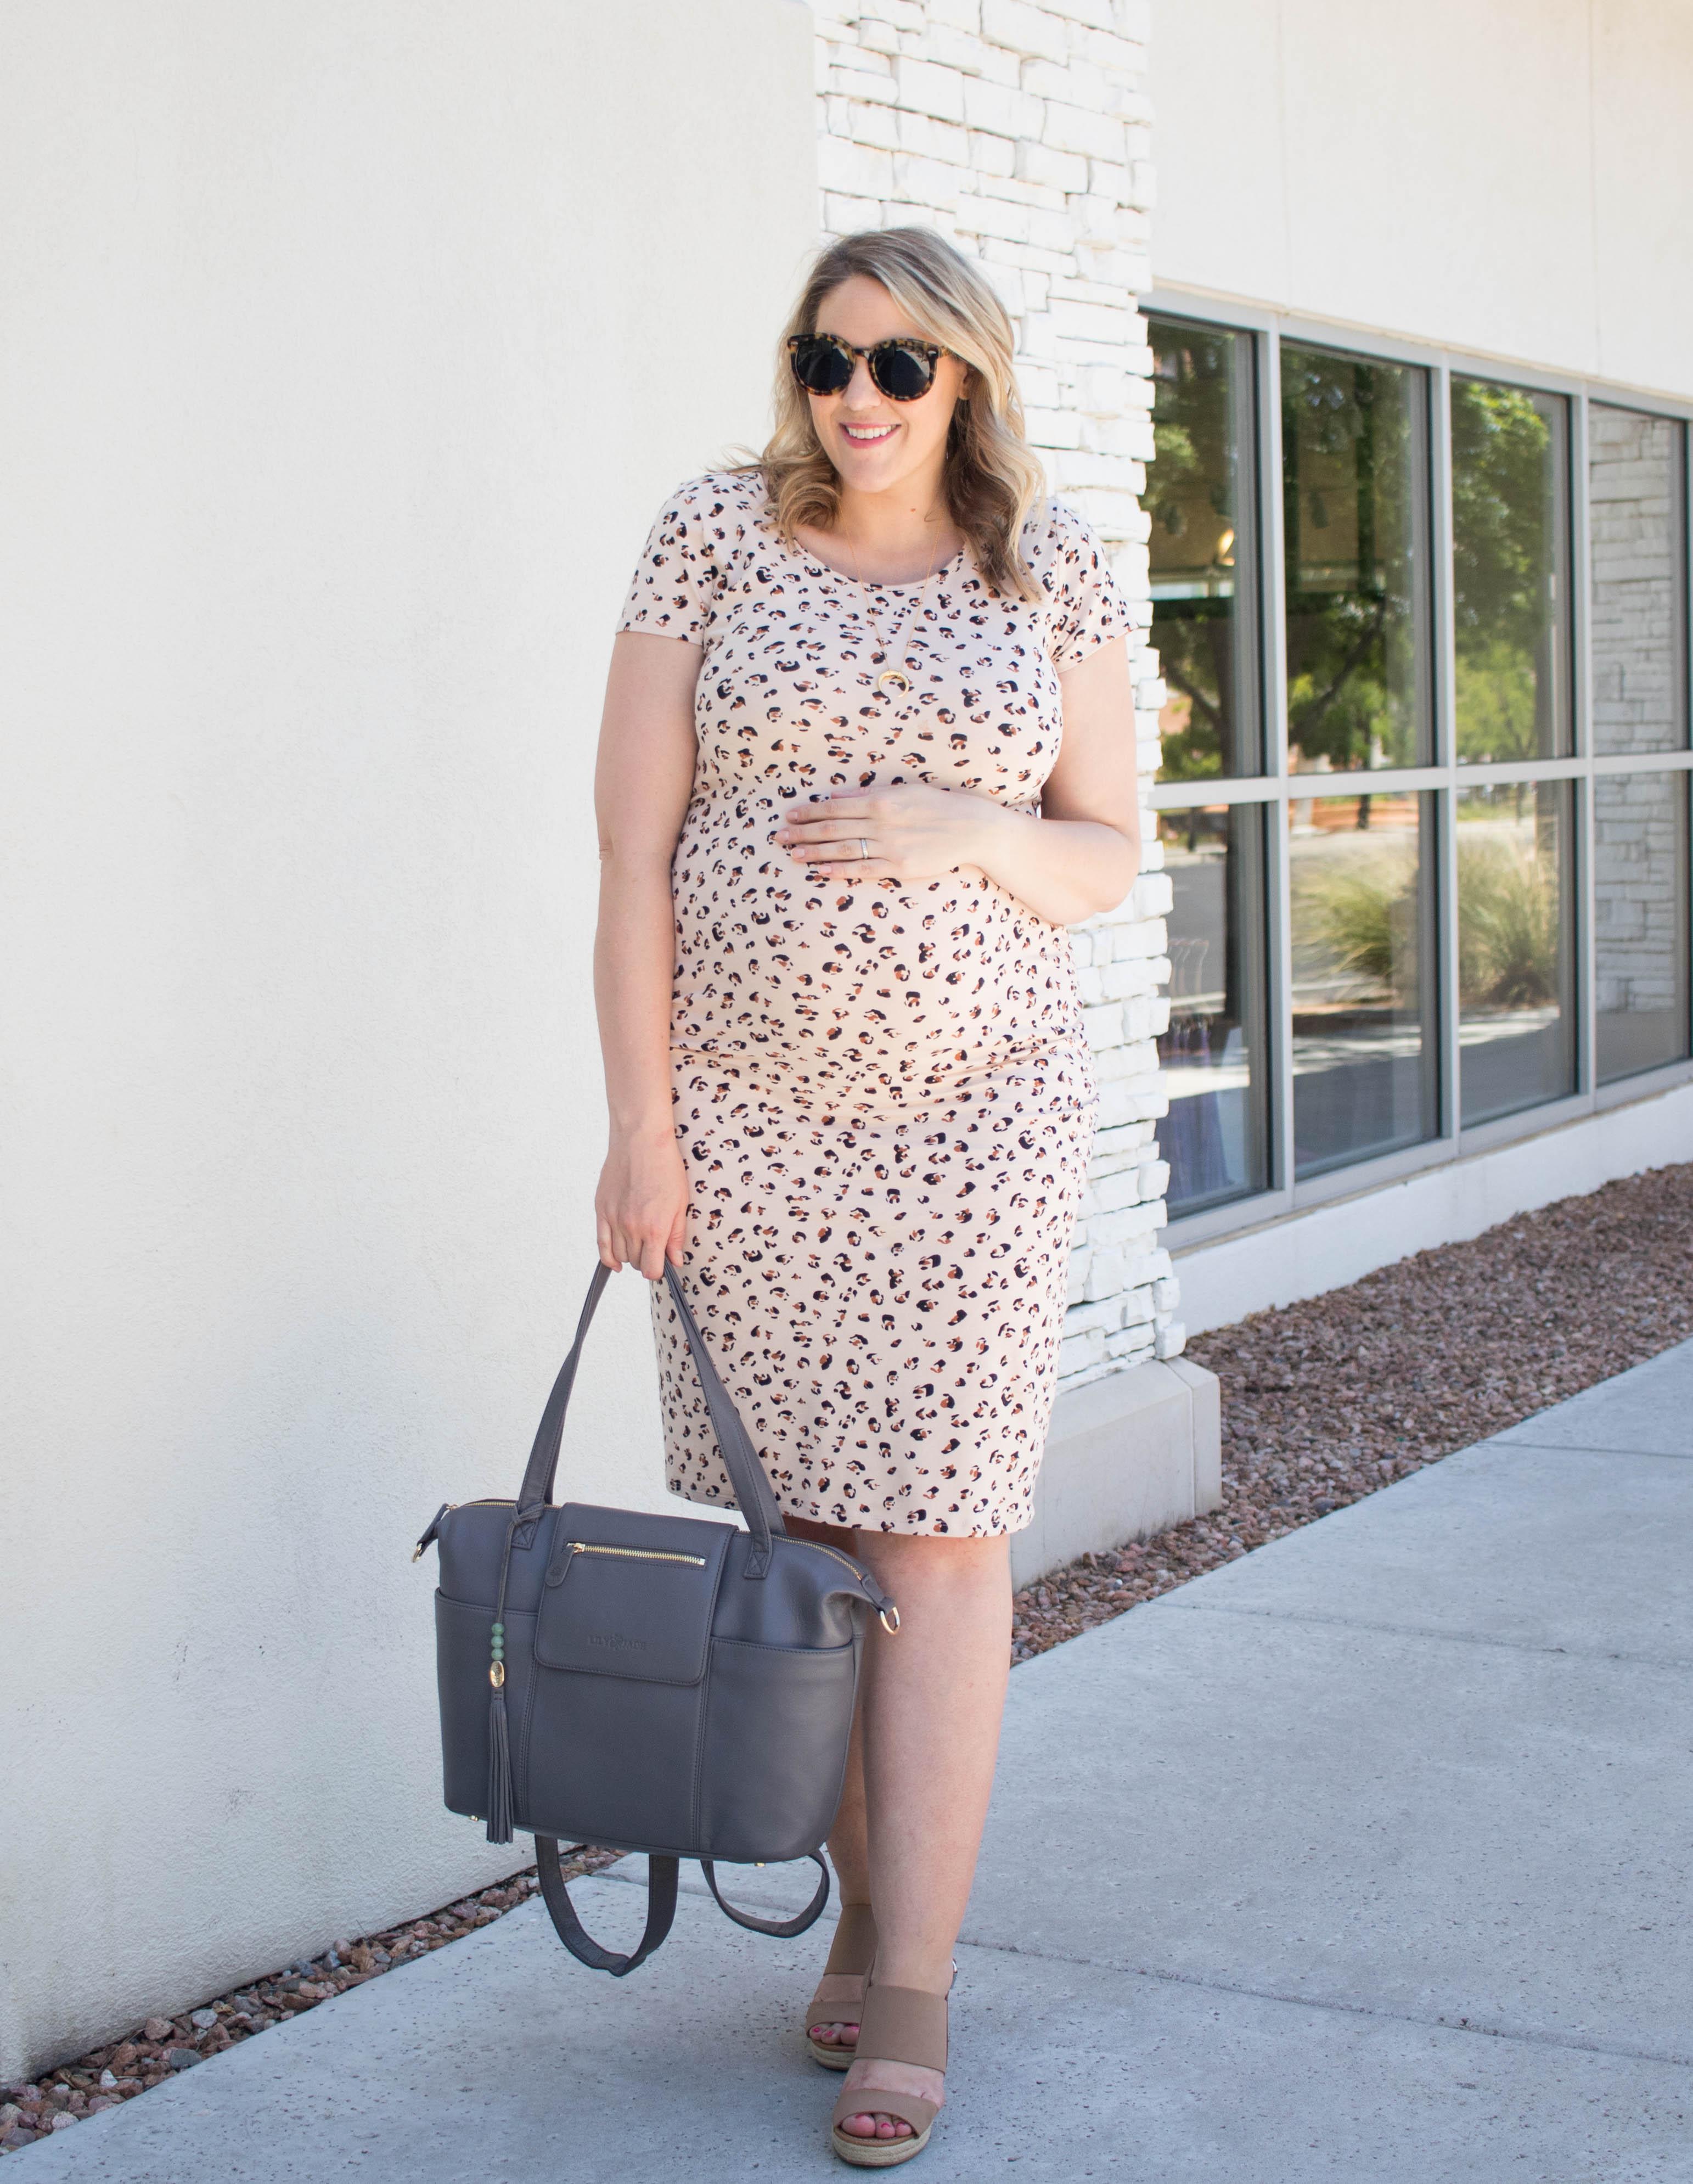 leopard print maternity dress target style #targetstyle #maternitystyle #pregnancy